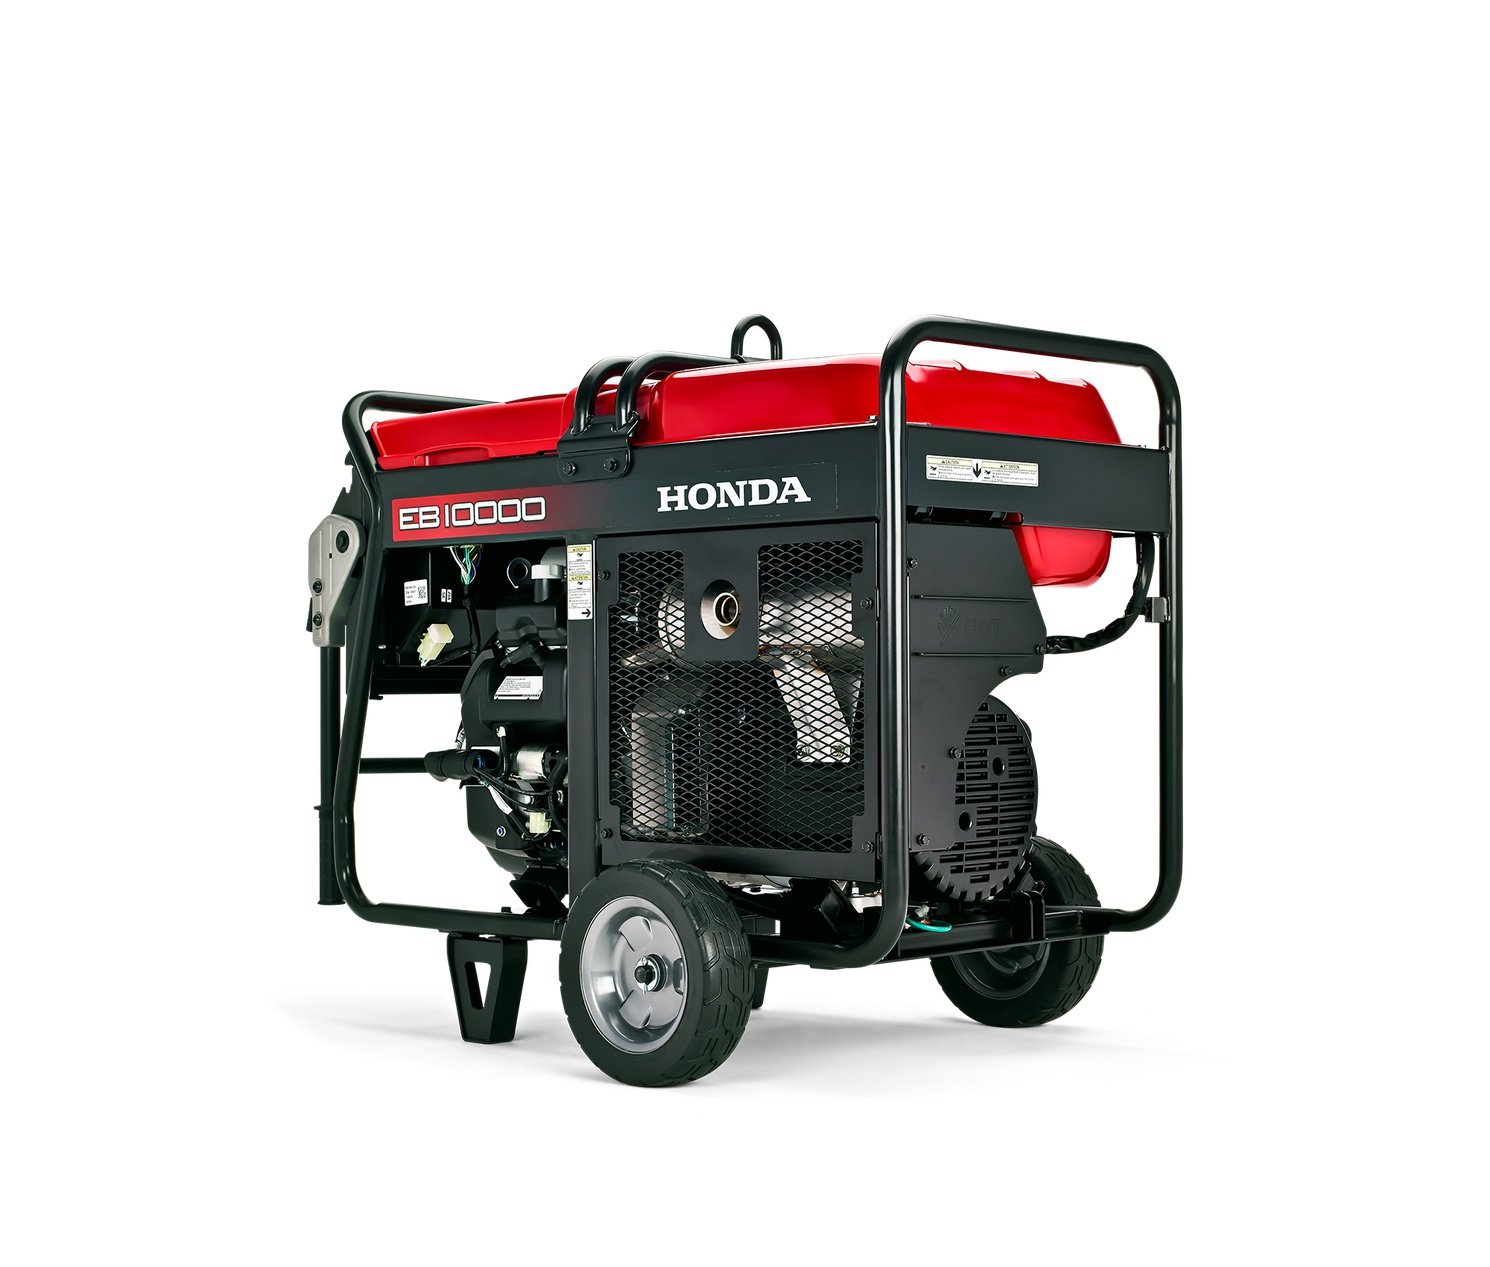 Honda Génératrices EB10000C1